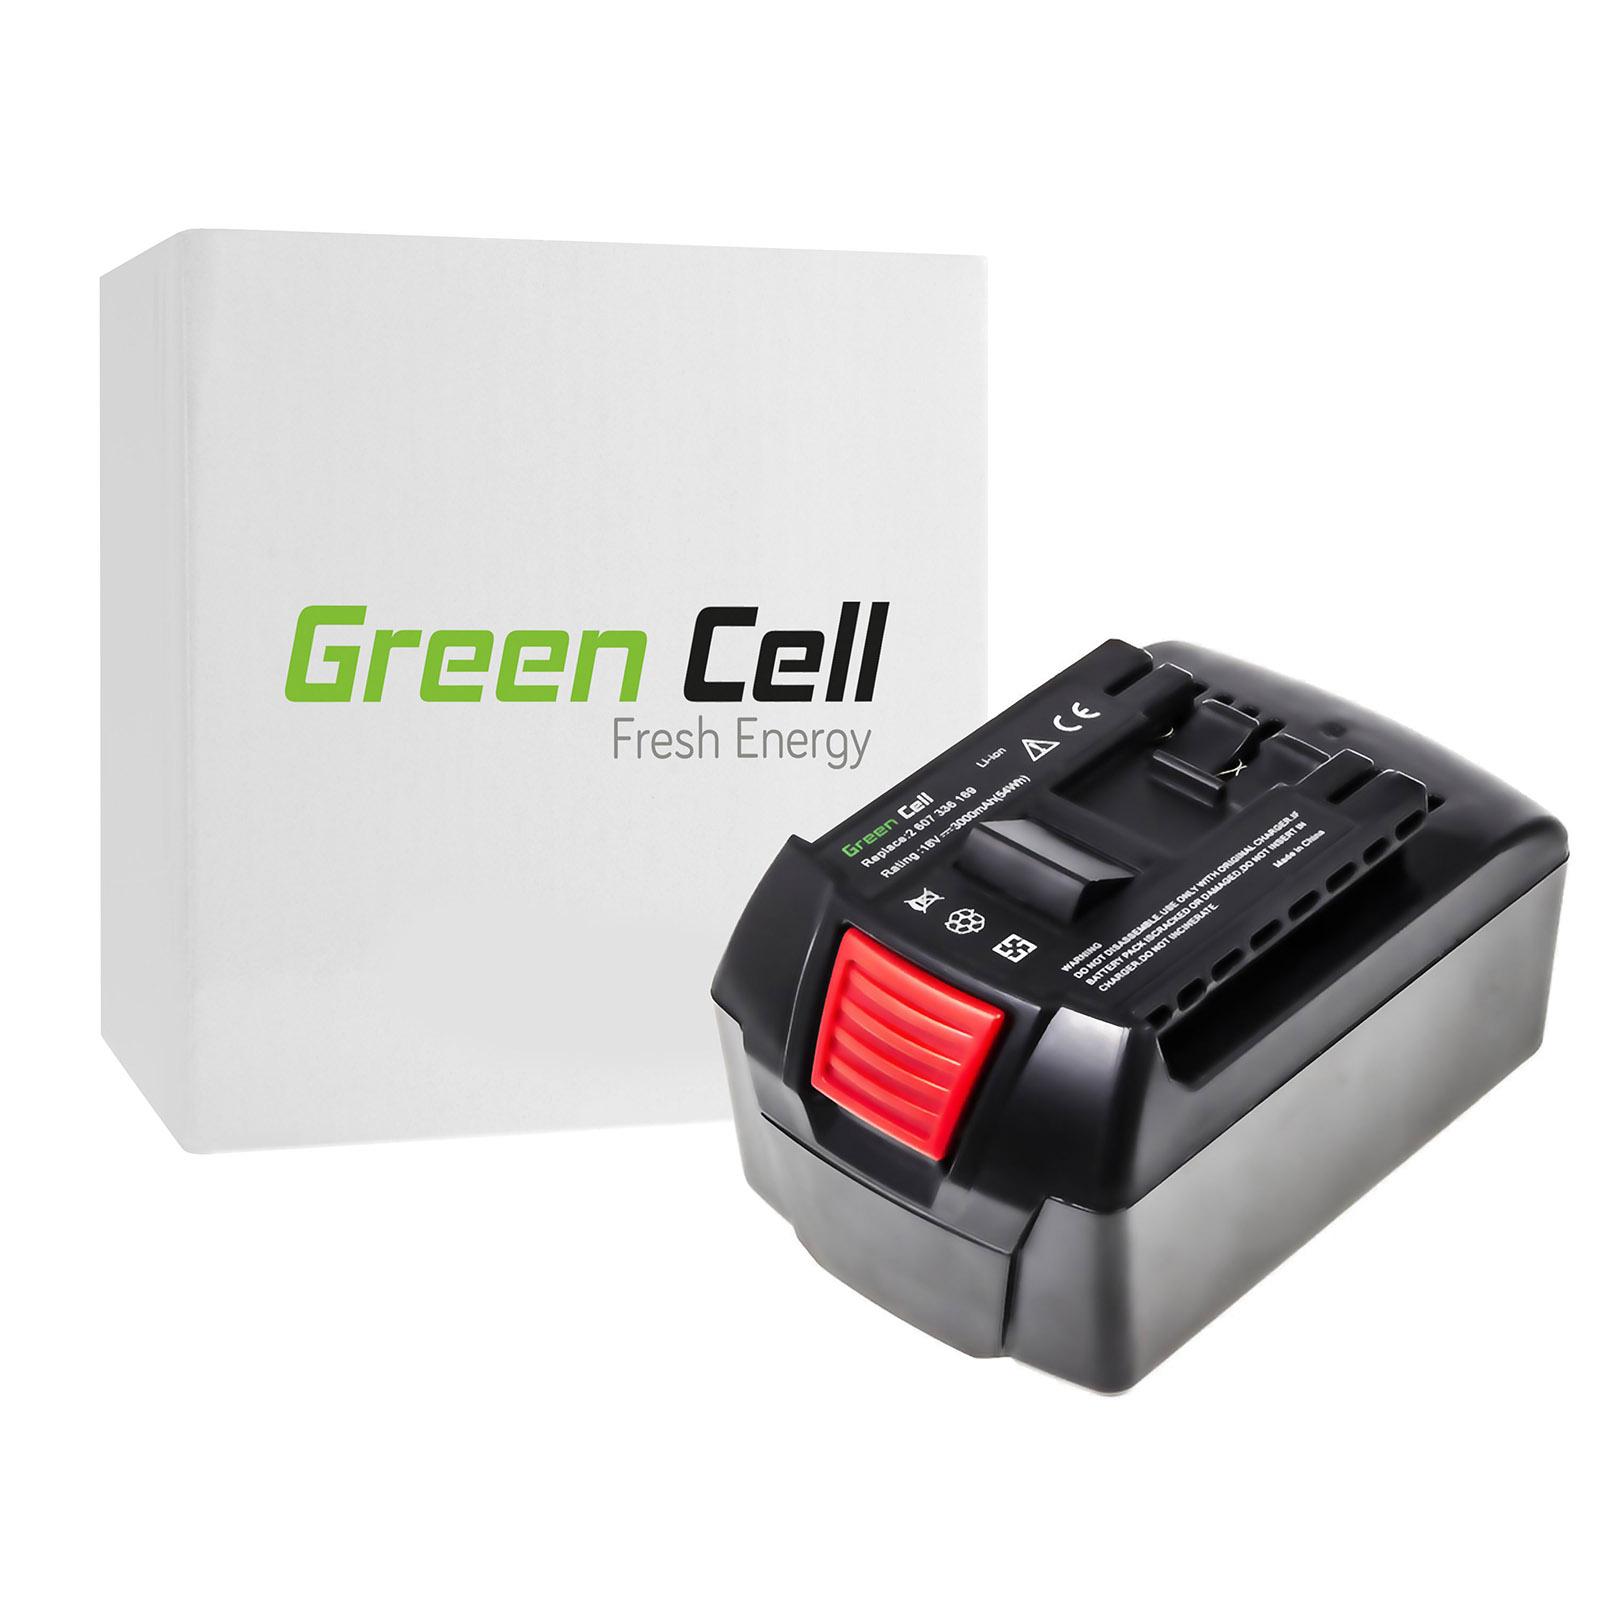 green cell power tool cordless battery for bosch gsr 18 v li 3 0ah 18v ebay. Black Bedroom Furniture Sets. Home Design Ideas